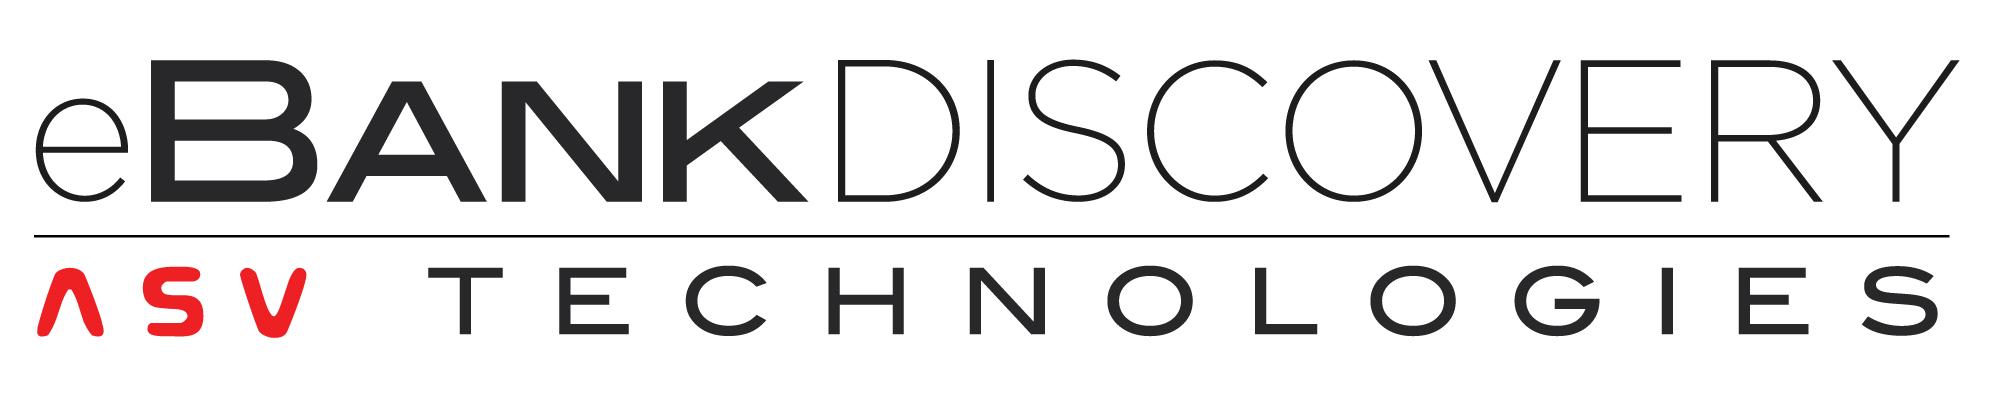 ebank-discovery-logo-blk-final.jpg